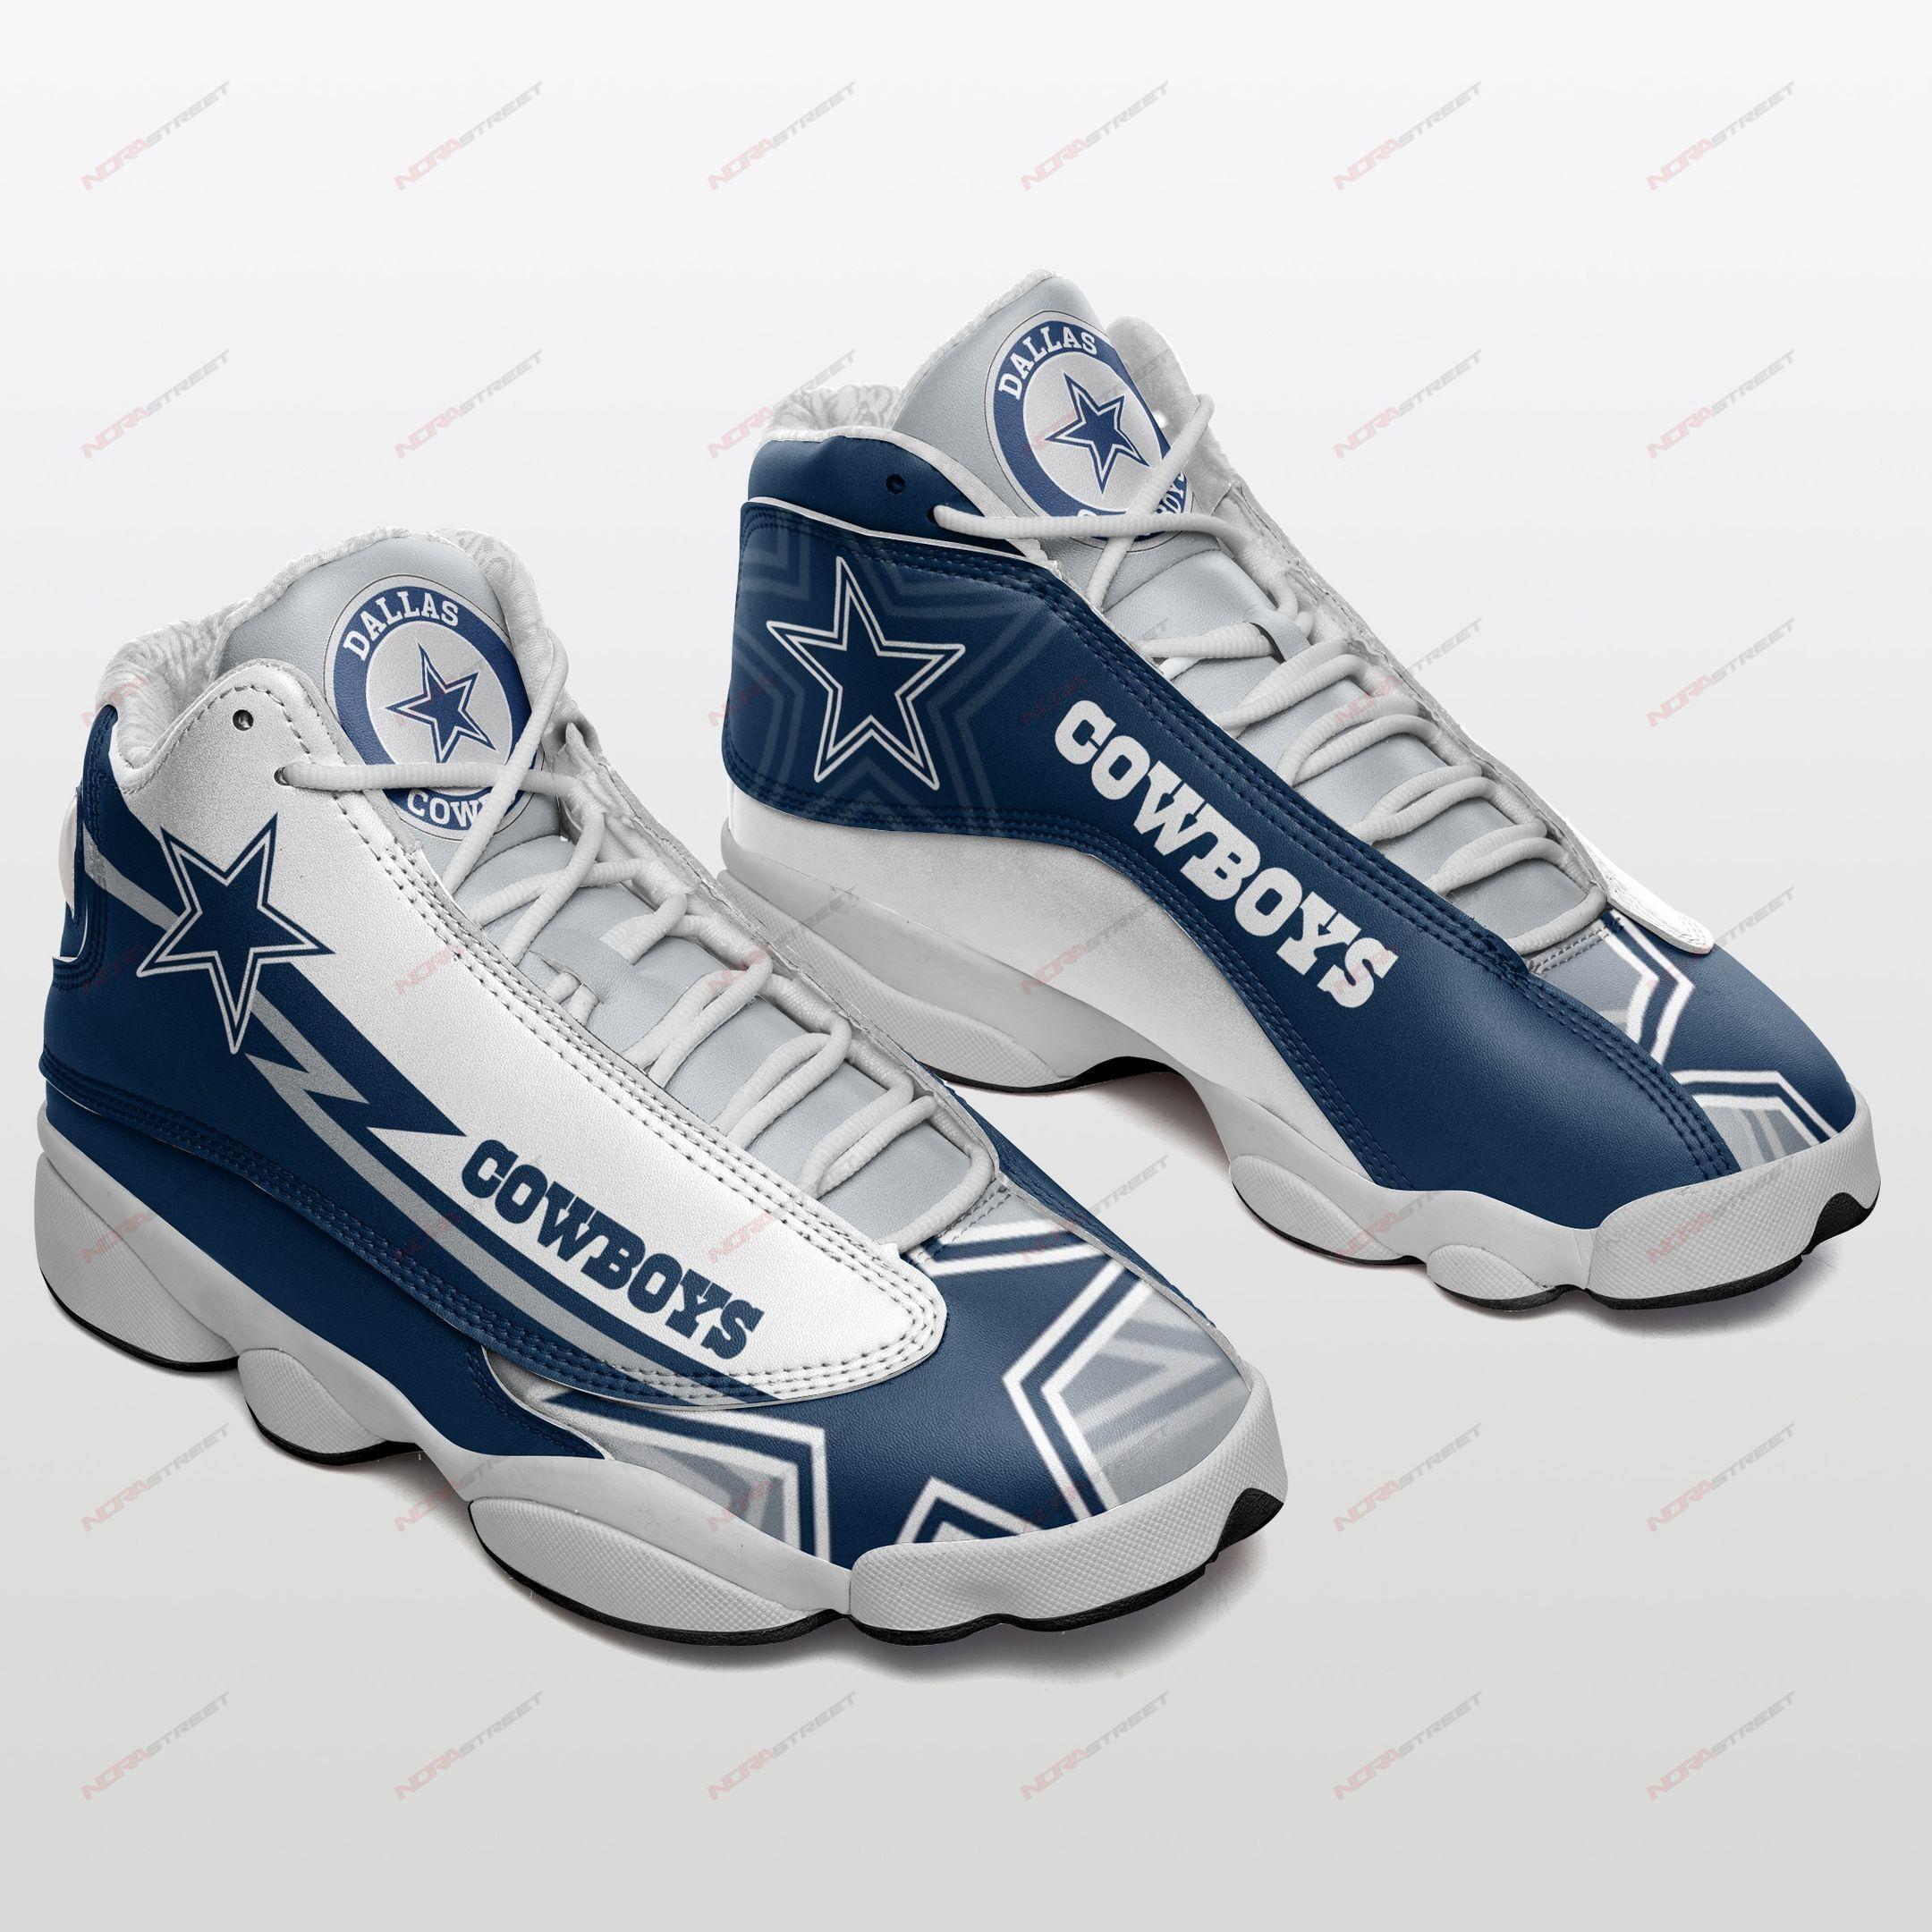 Dallas Cowboys Air Jordan 13 Sneakers Sport Shoes Plus Size